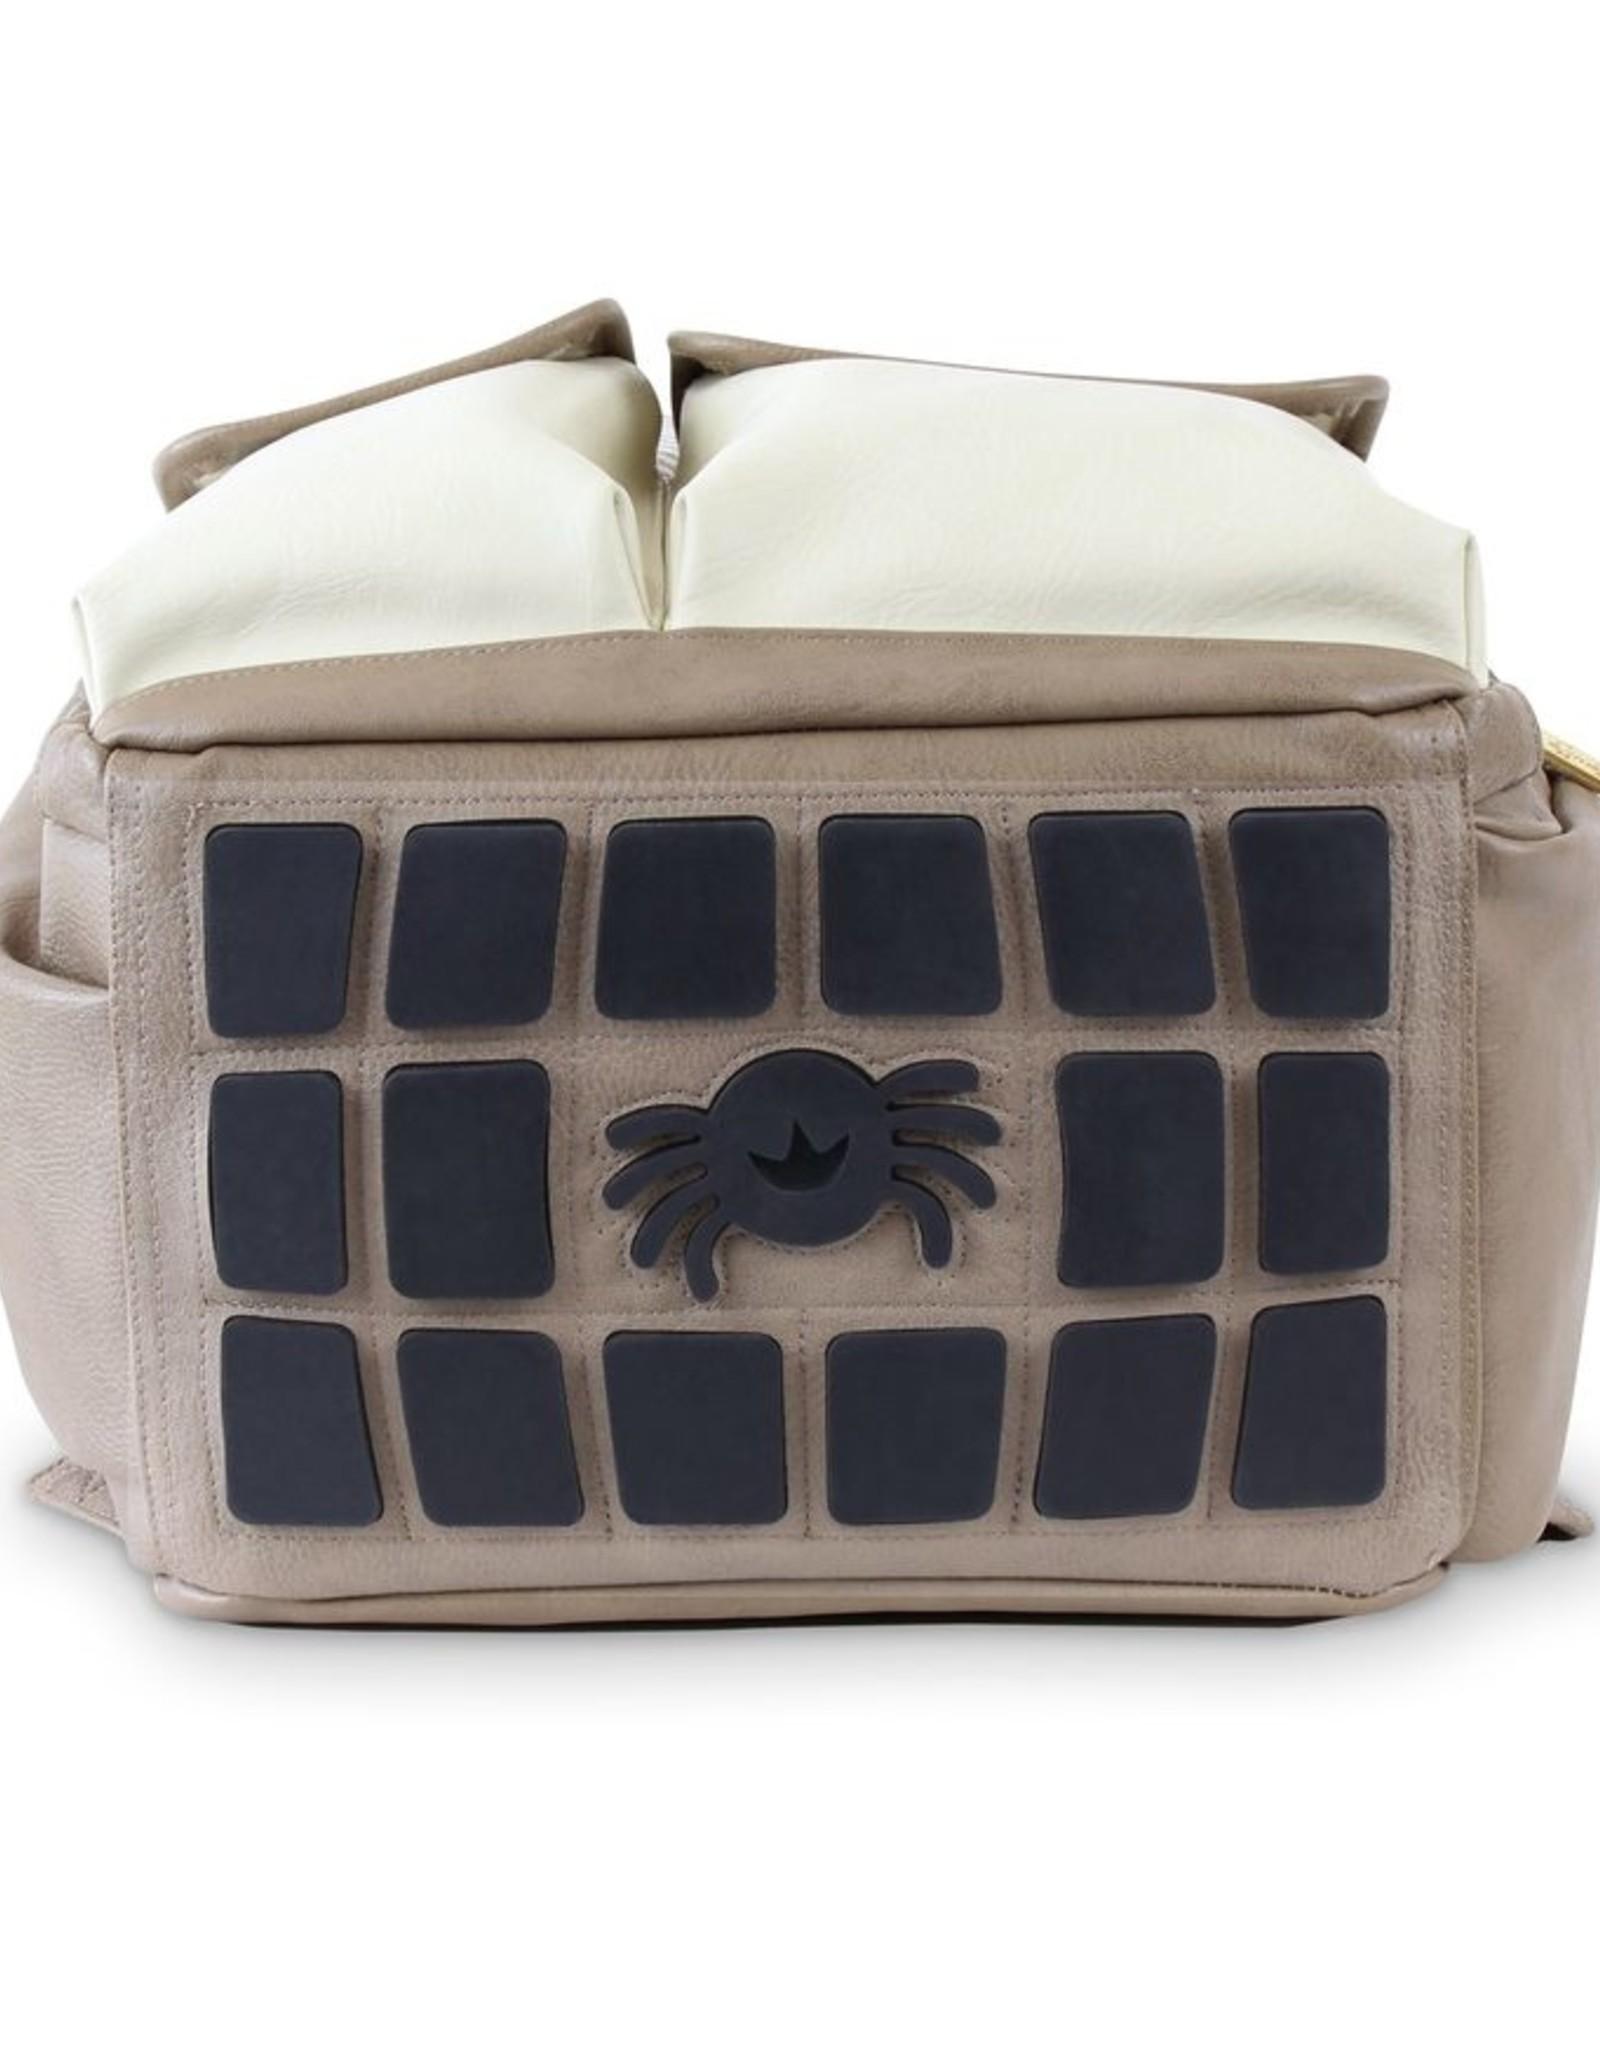 Itzy Ritzy Boss Diaper Bag